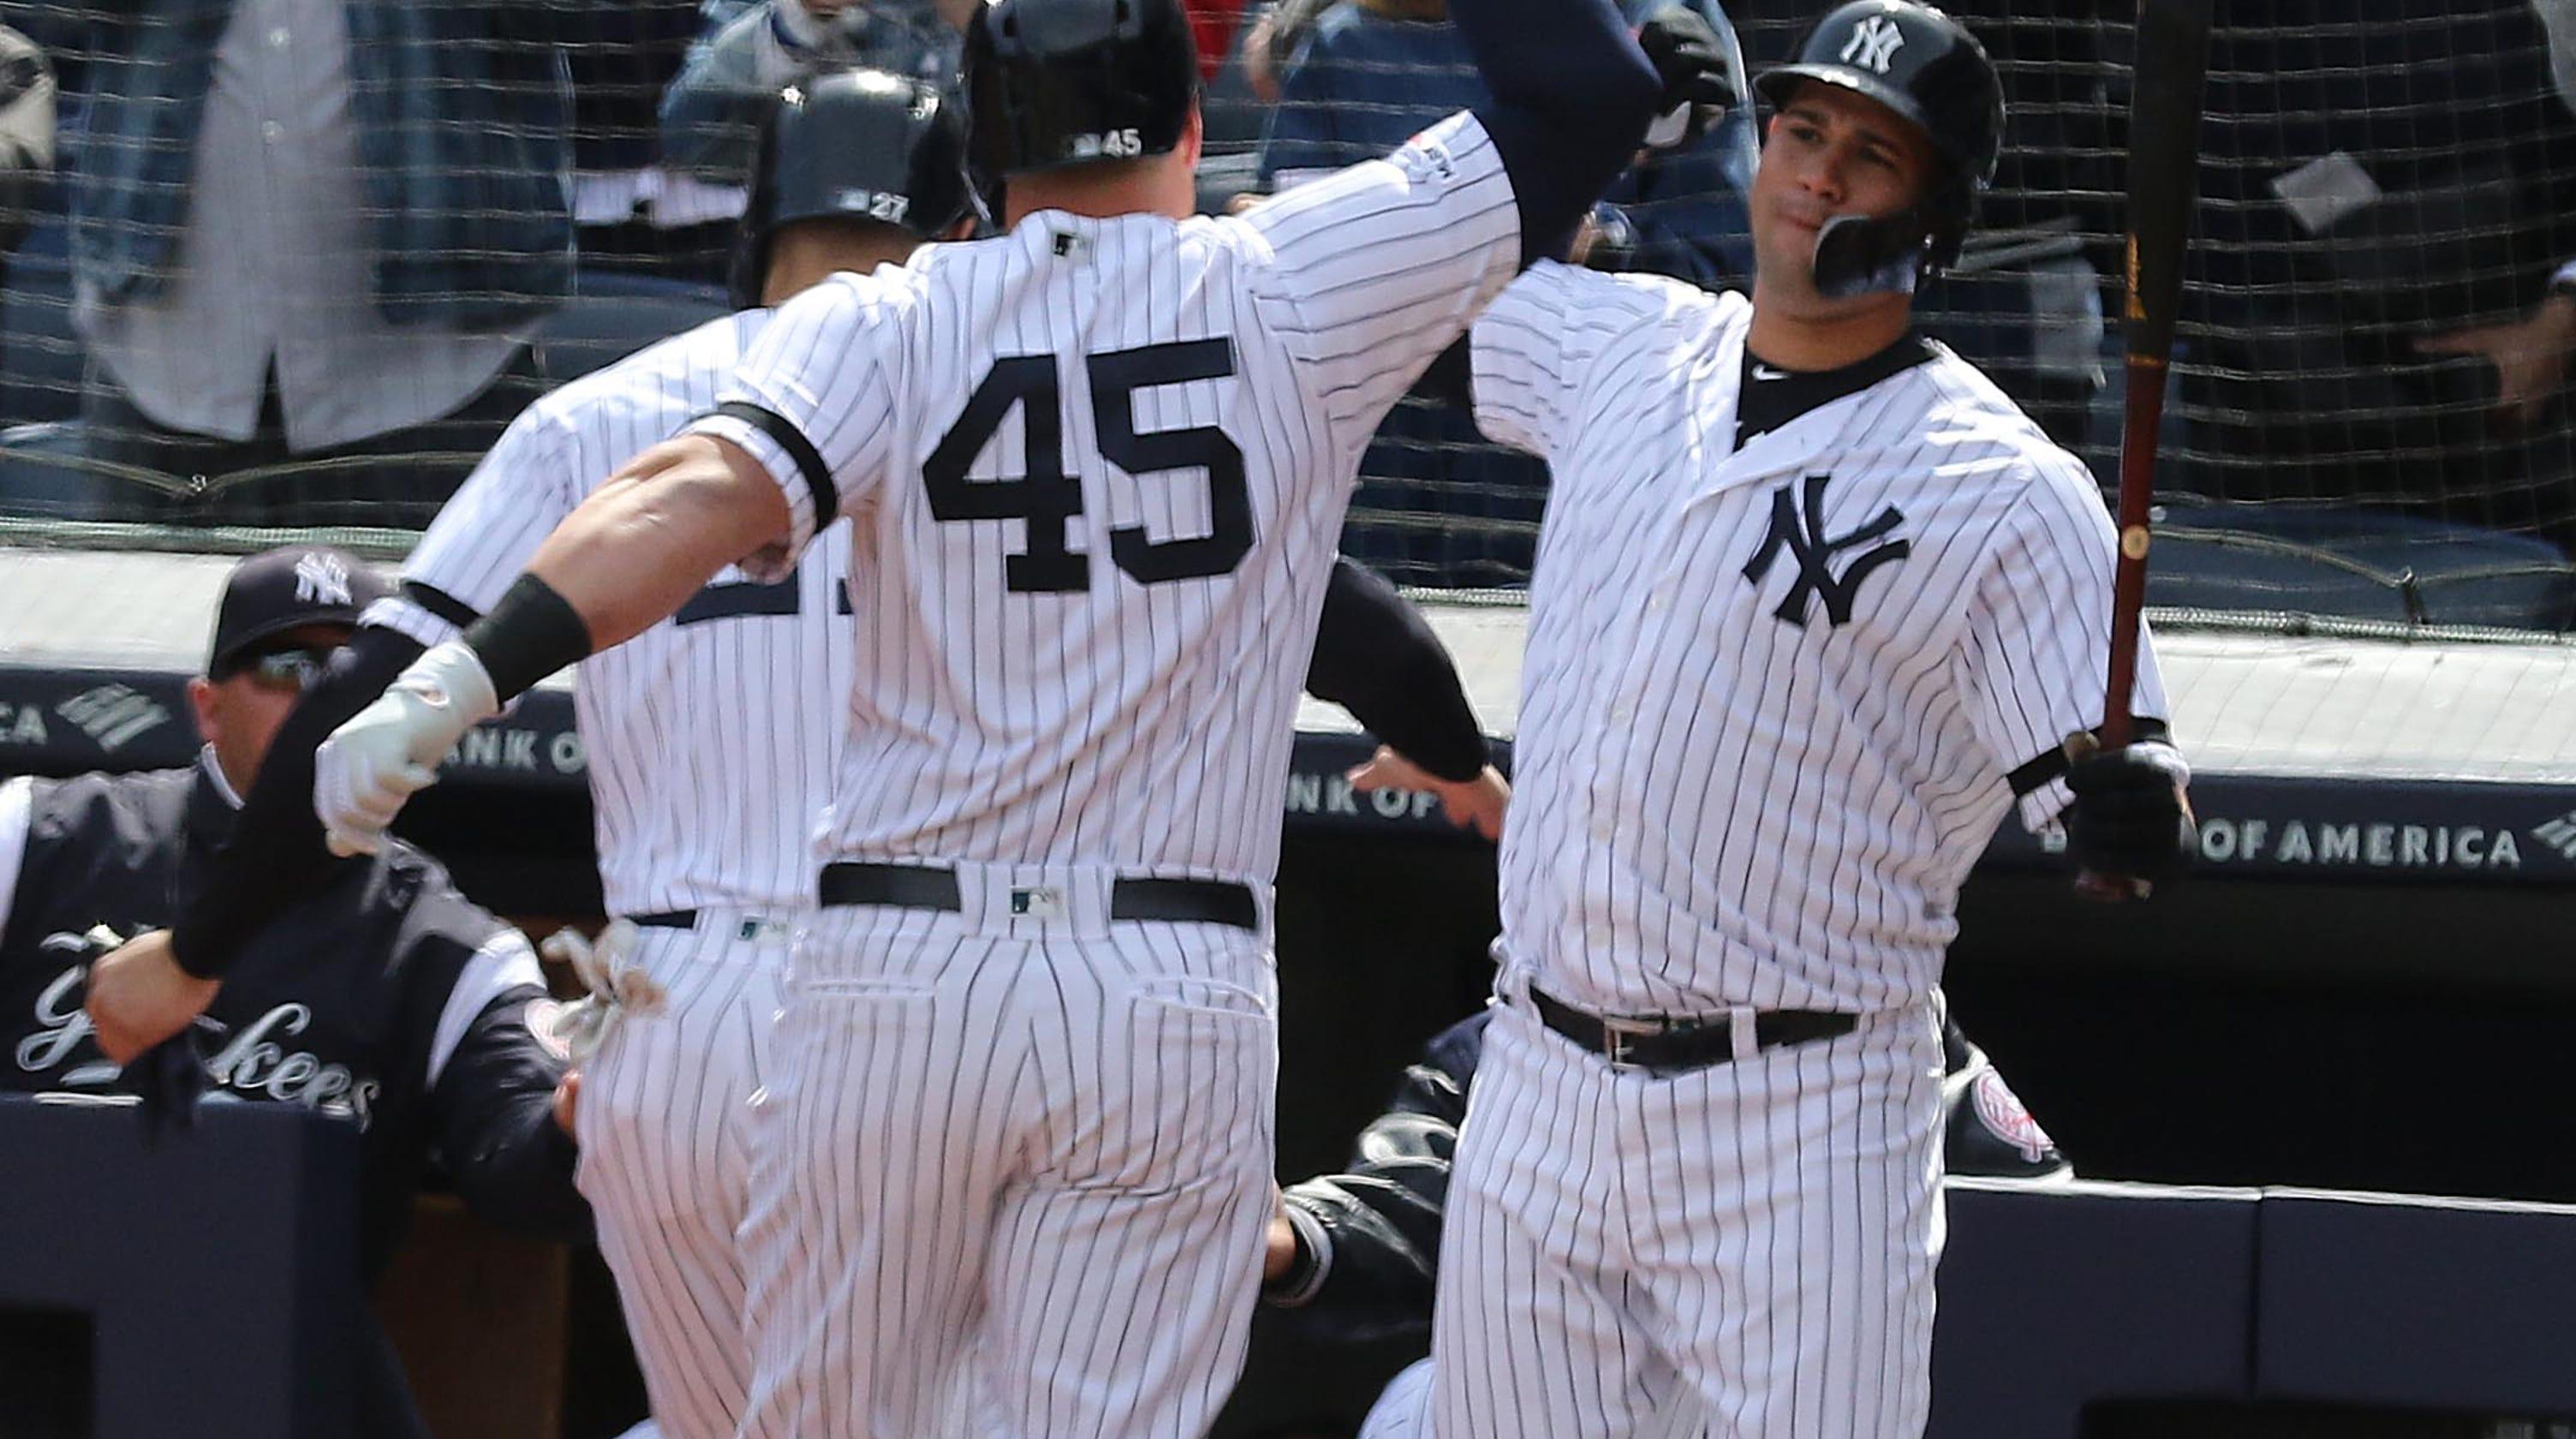 online retailer 857aa 4f5a7 Luke Voit hits first New York Yankees' home run of the season